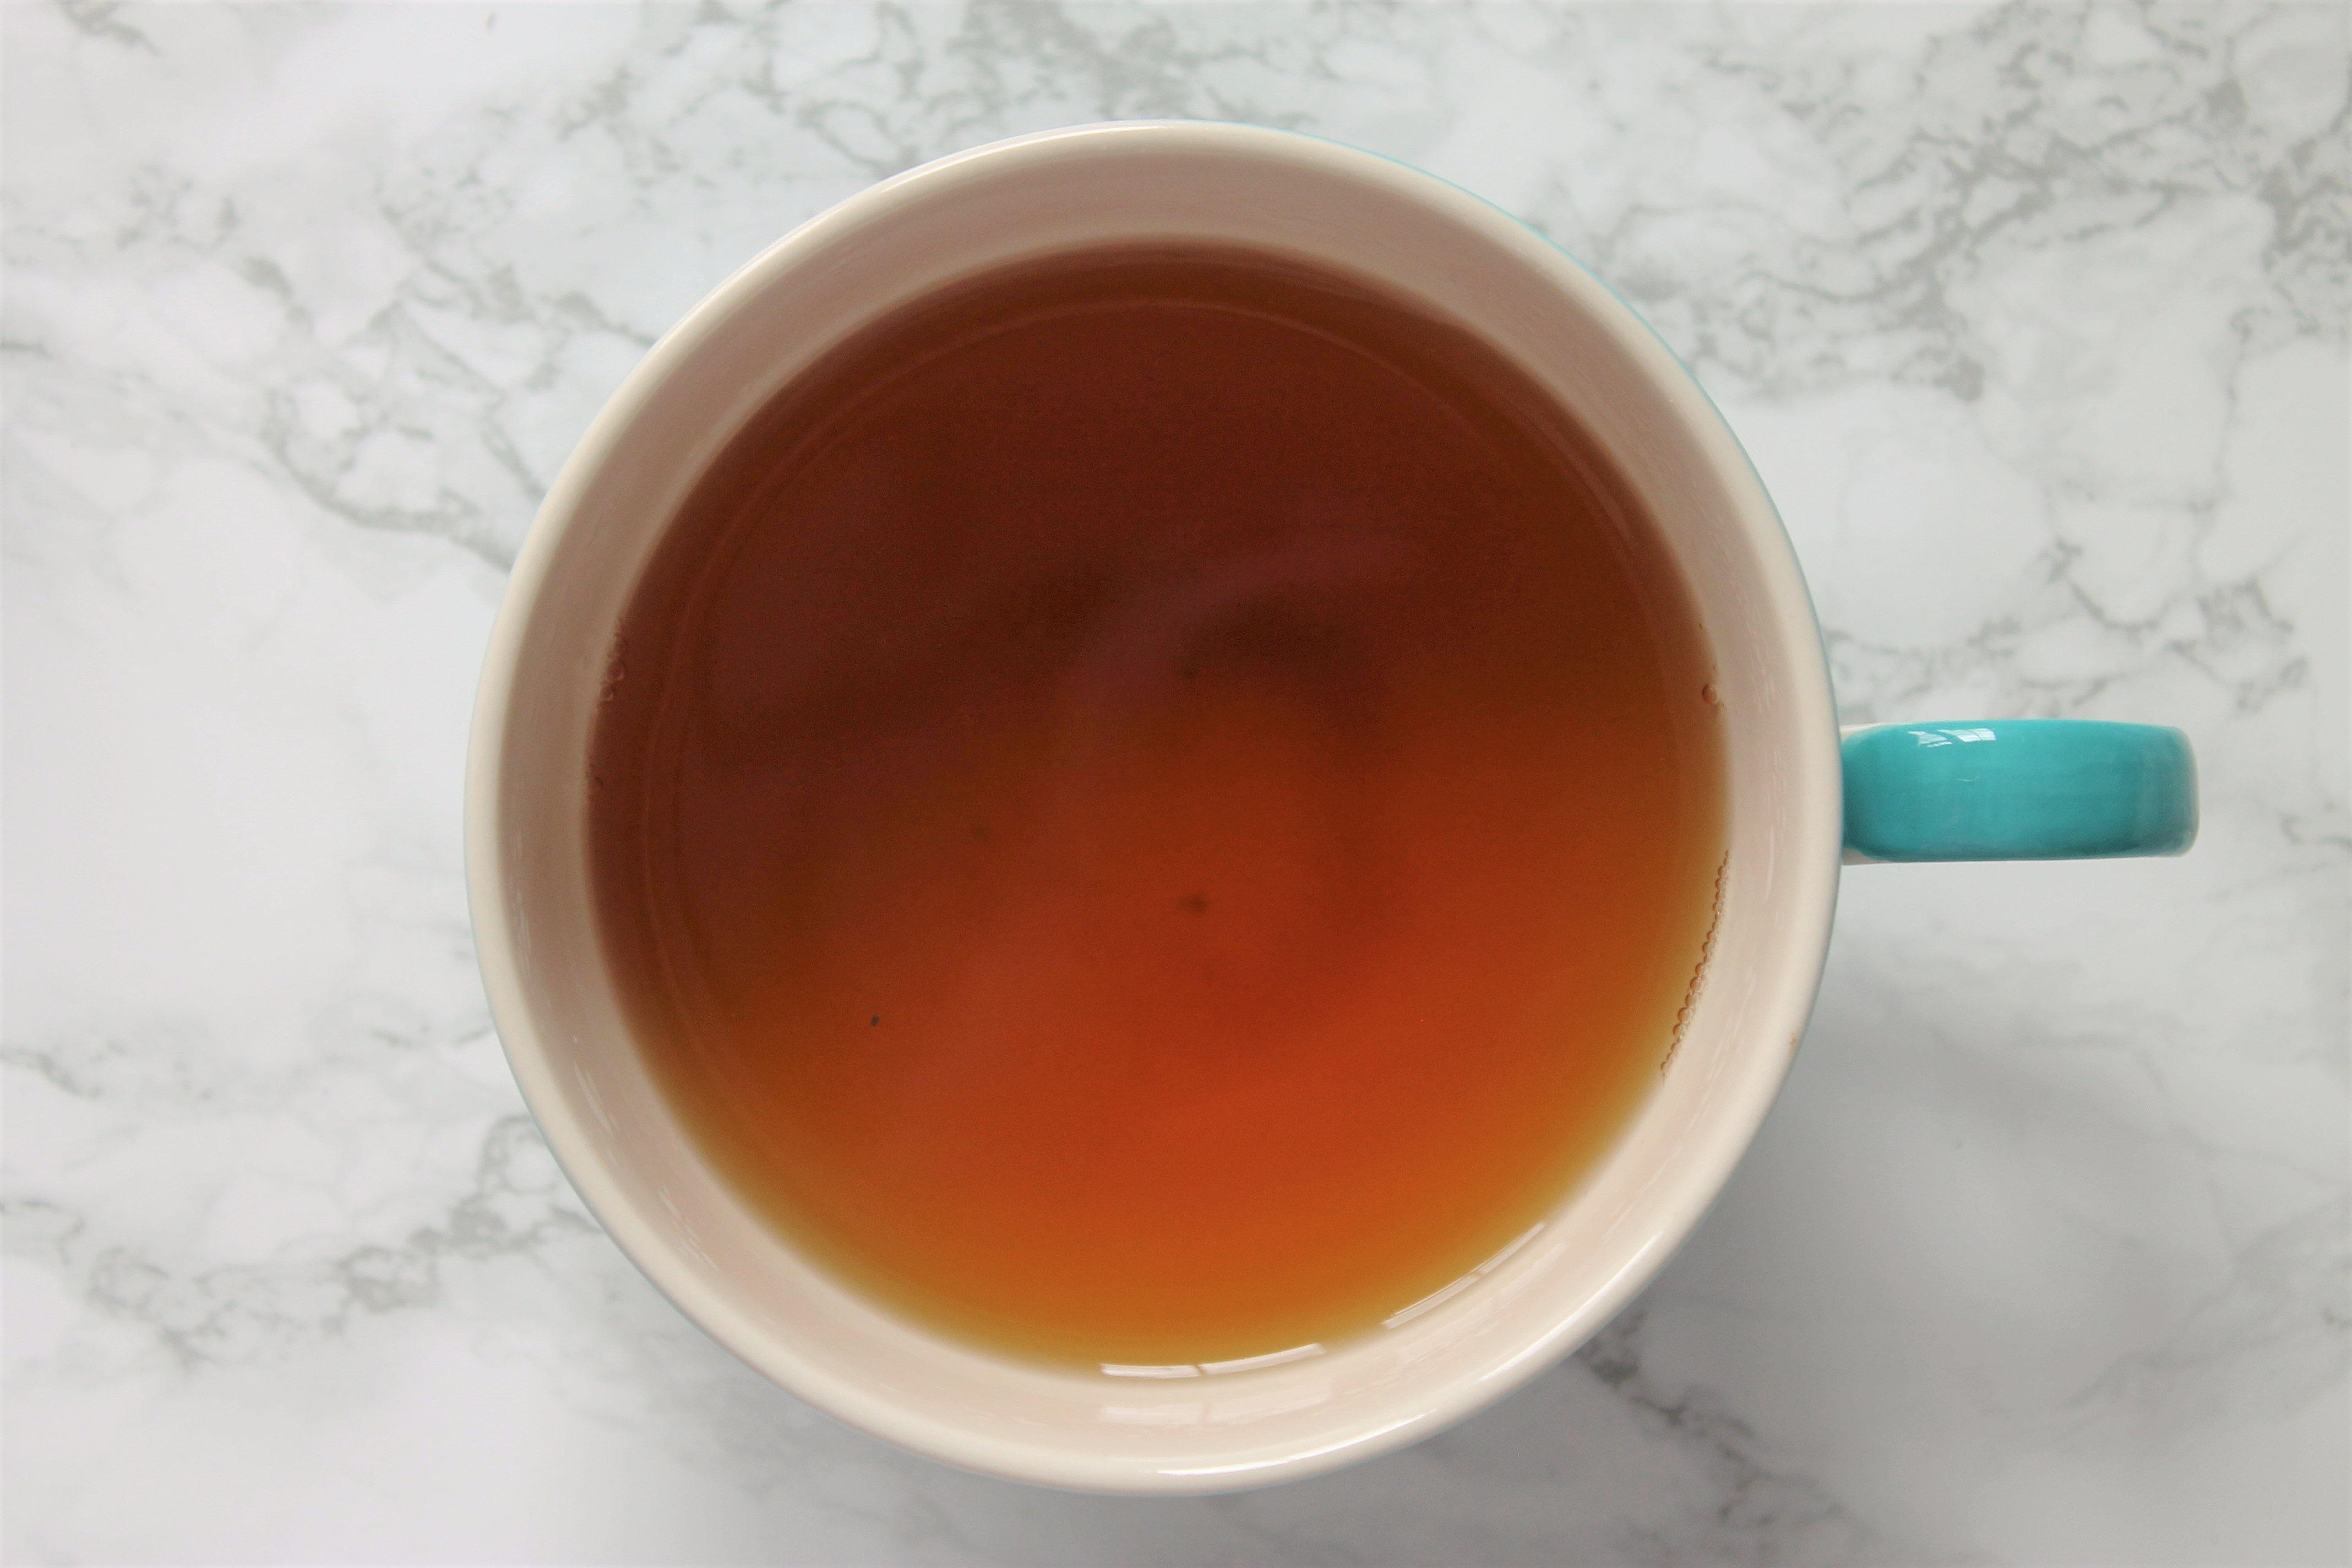 ginger peach tea in teacup